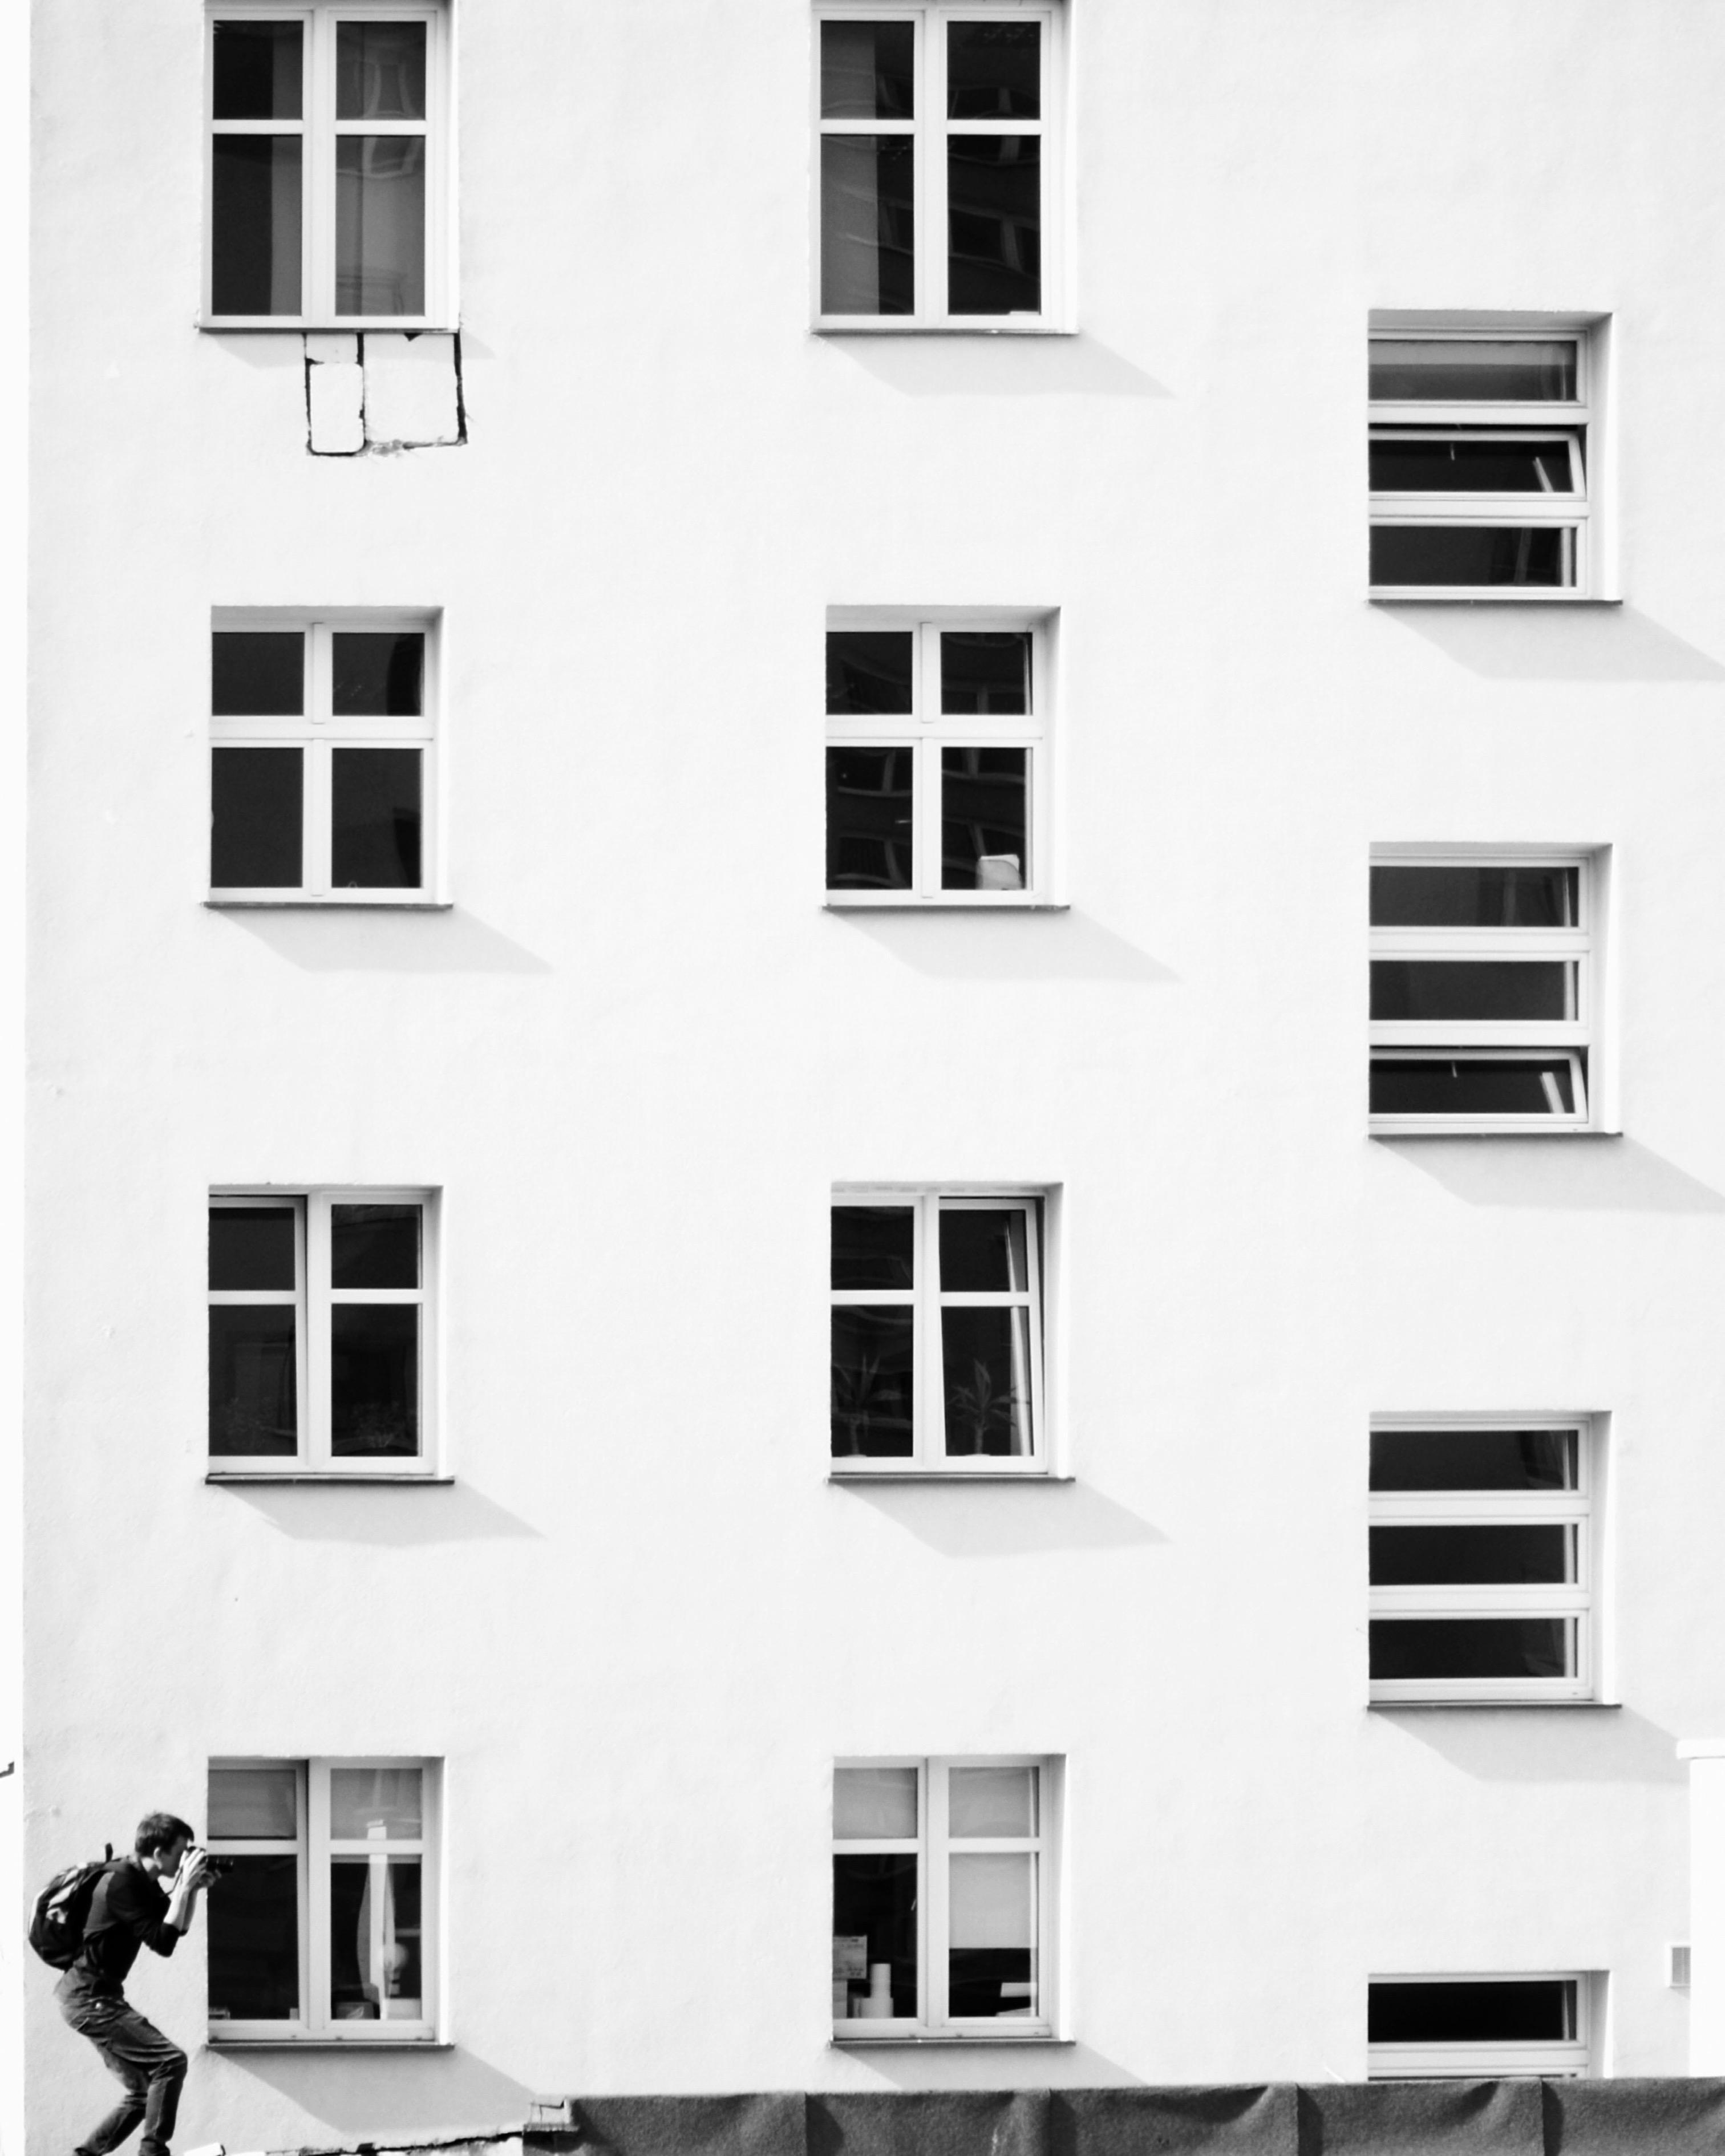 fot. Urszula Aniserowicz,kat. Inspiracje Modernizmem